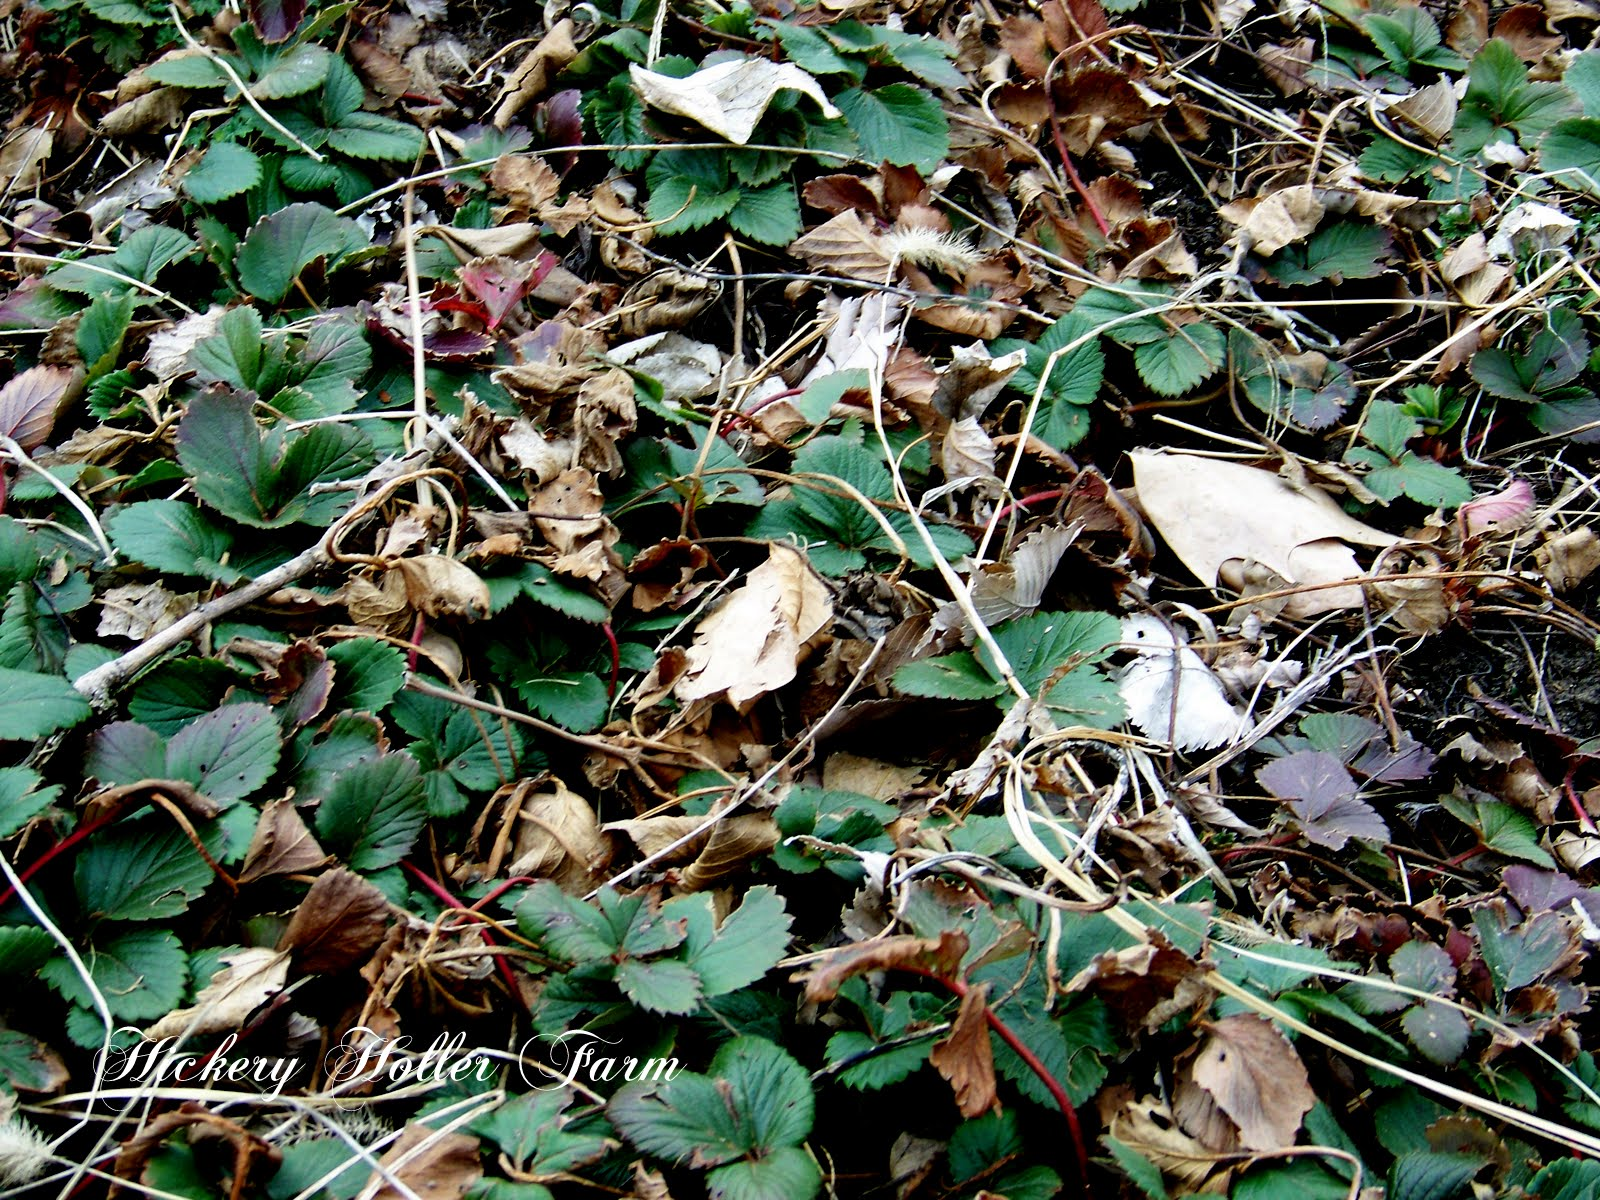 Where Put Leaves After Raking